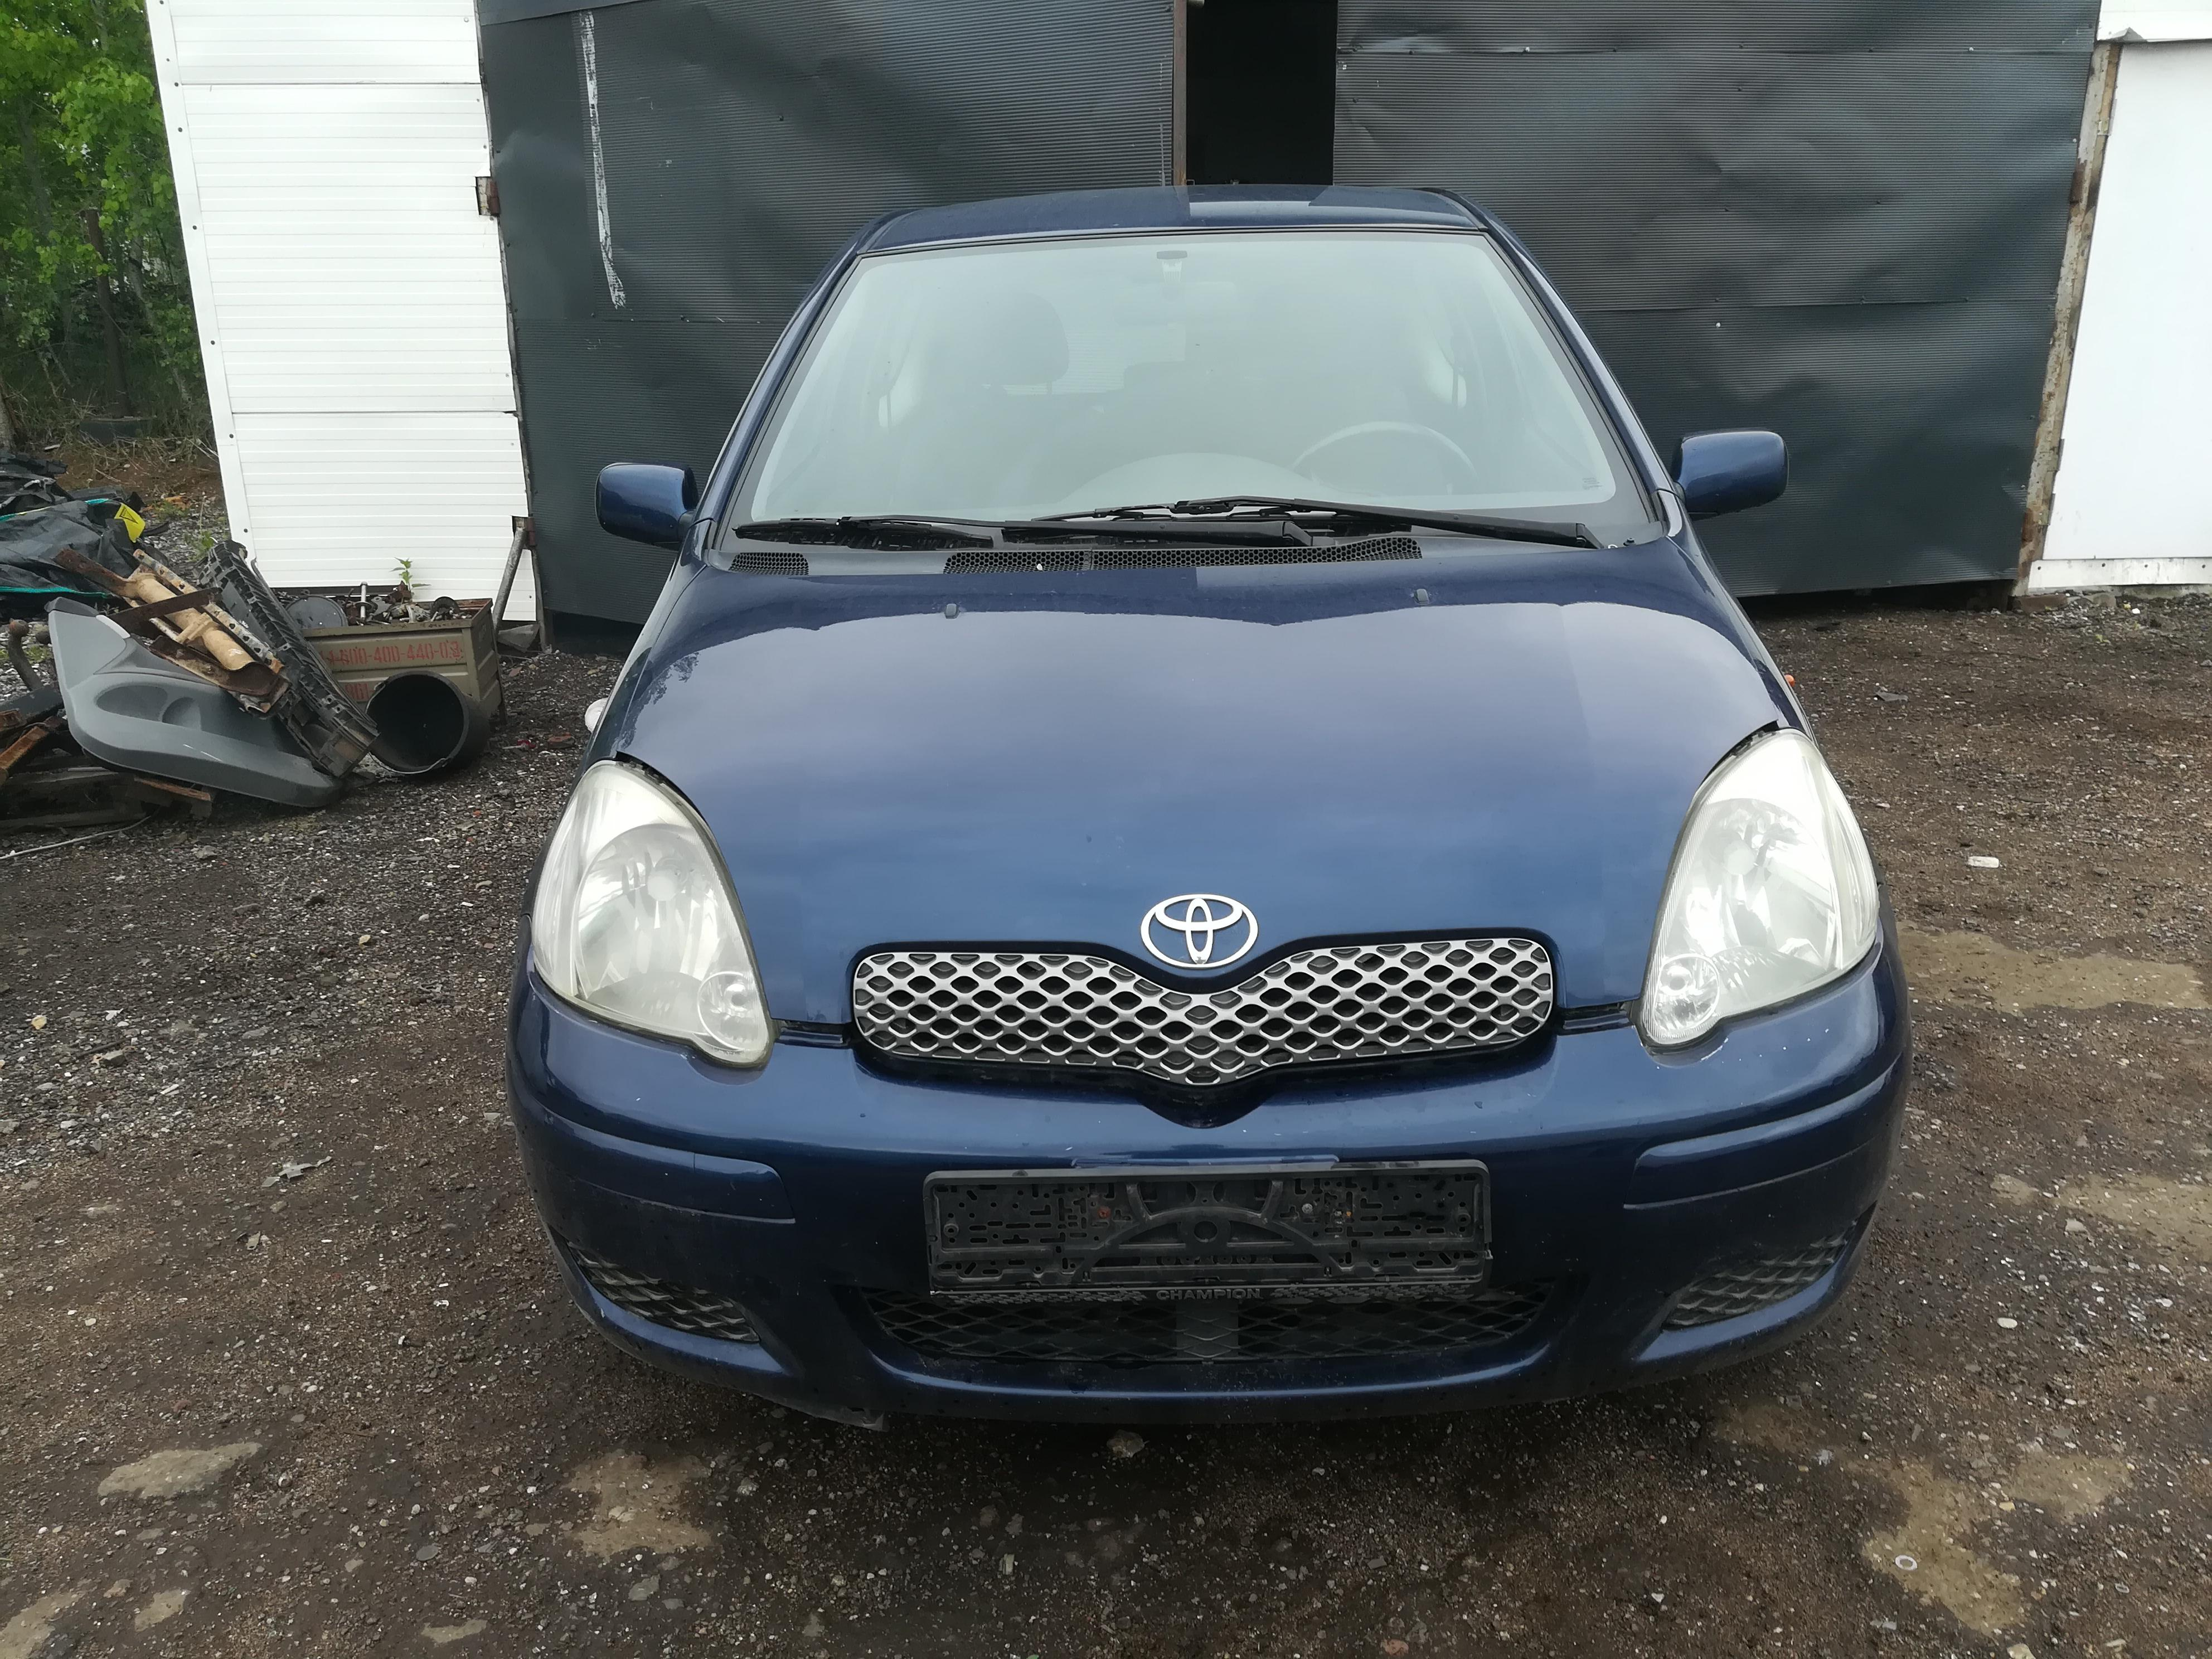 Toyota YARIS 2003 1.4 Mechaninė